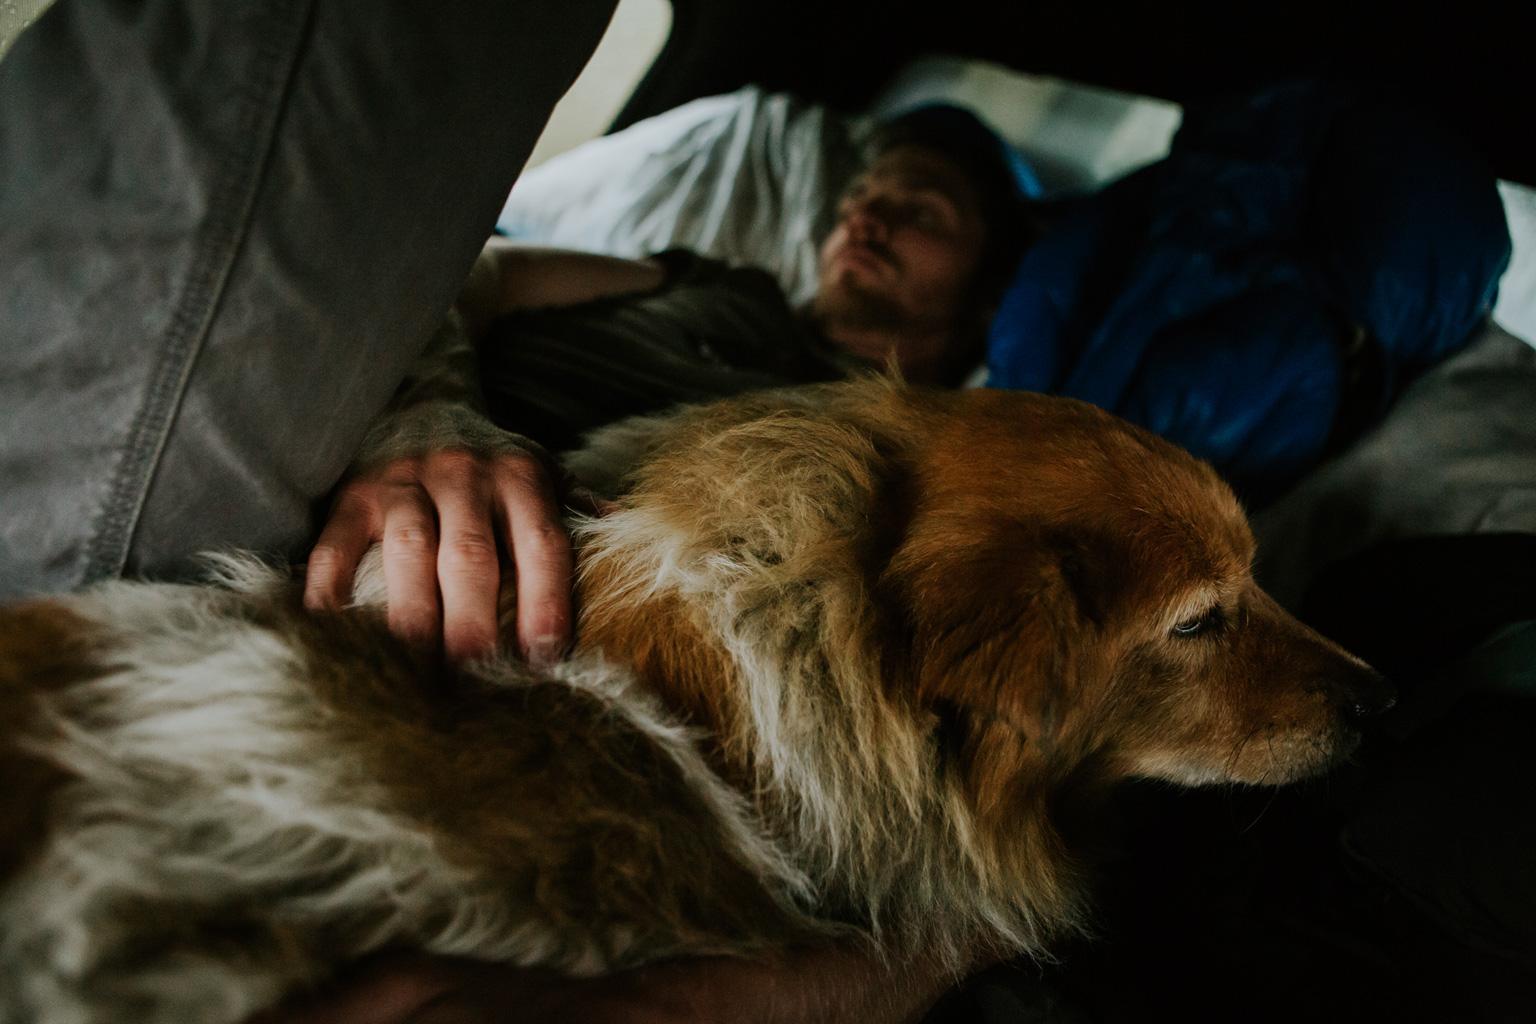 CindyGiovagnoli_BritishColumbia_Yukon_Alaska_roadtrip_AlCan_Alaskan_Highway_truck_camping-031.jpg